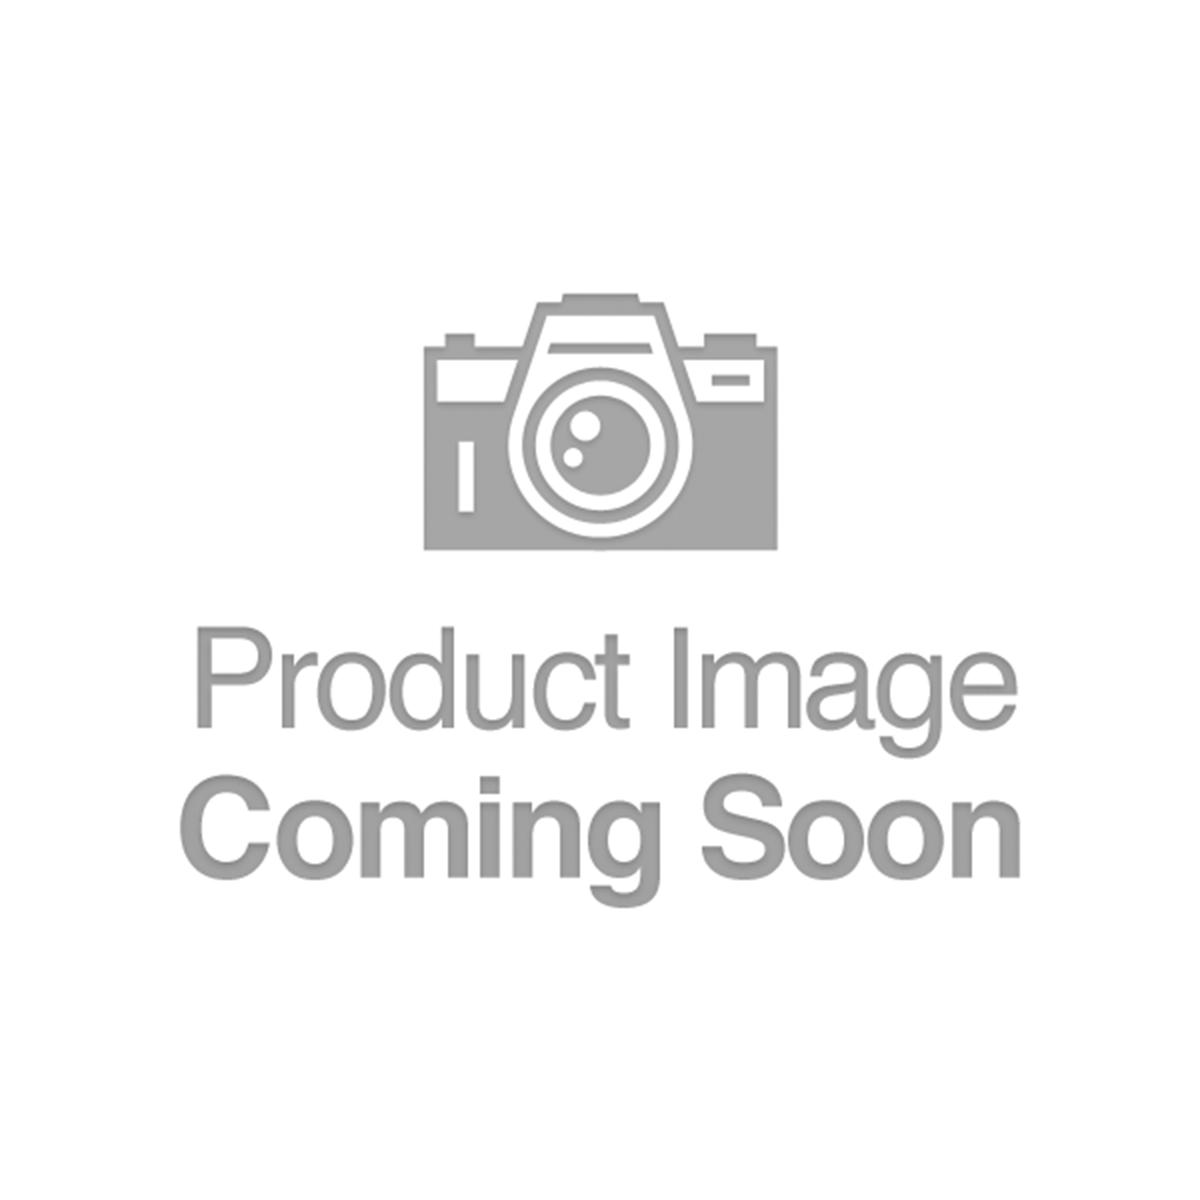 Deadwood - South Dakota - CH 2391 - FR 2391 - PMG 25